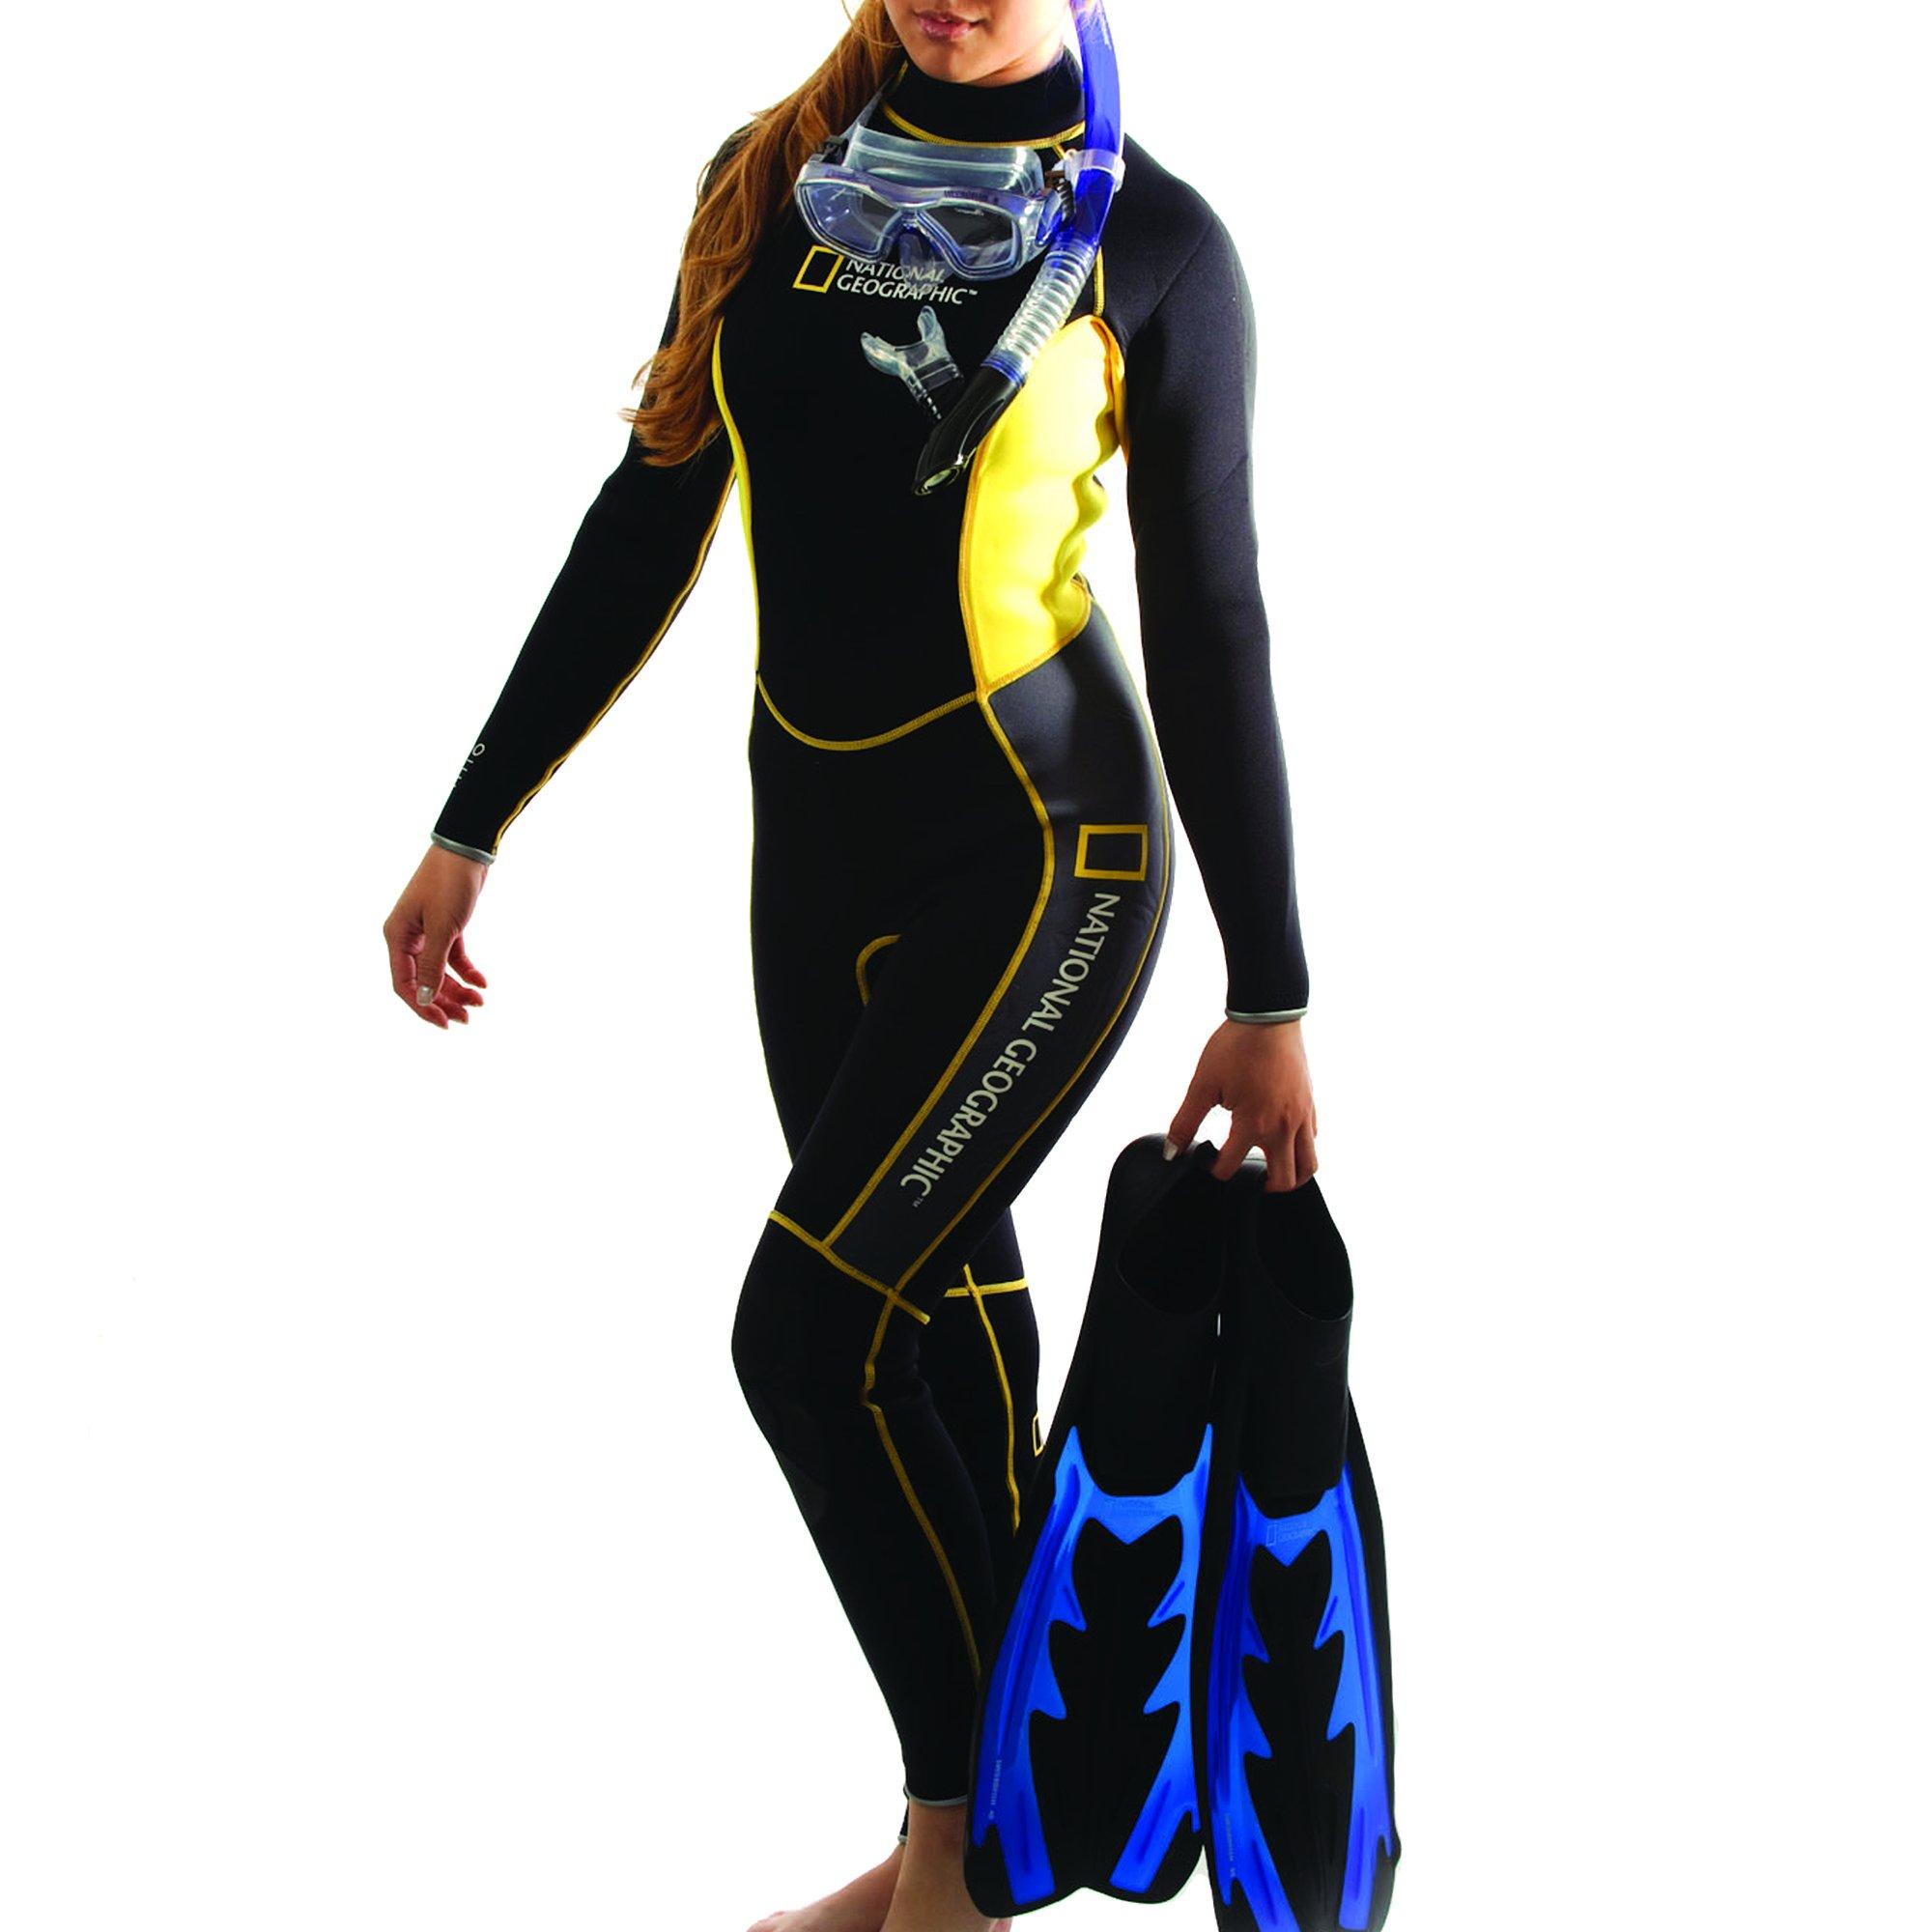 National Geographic Snorkeler Ladies Classic 1 Piece Suit, Large 5674